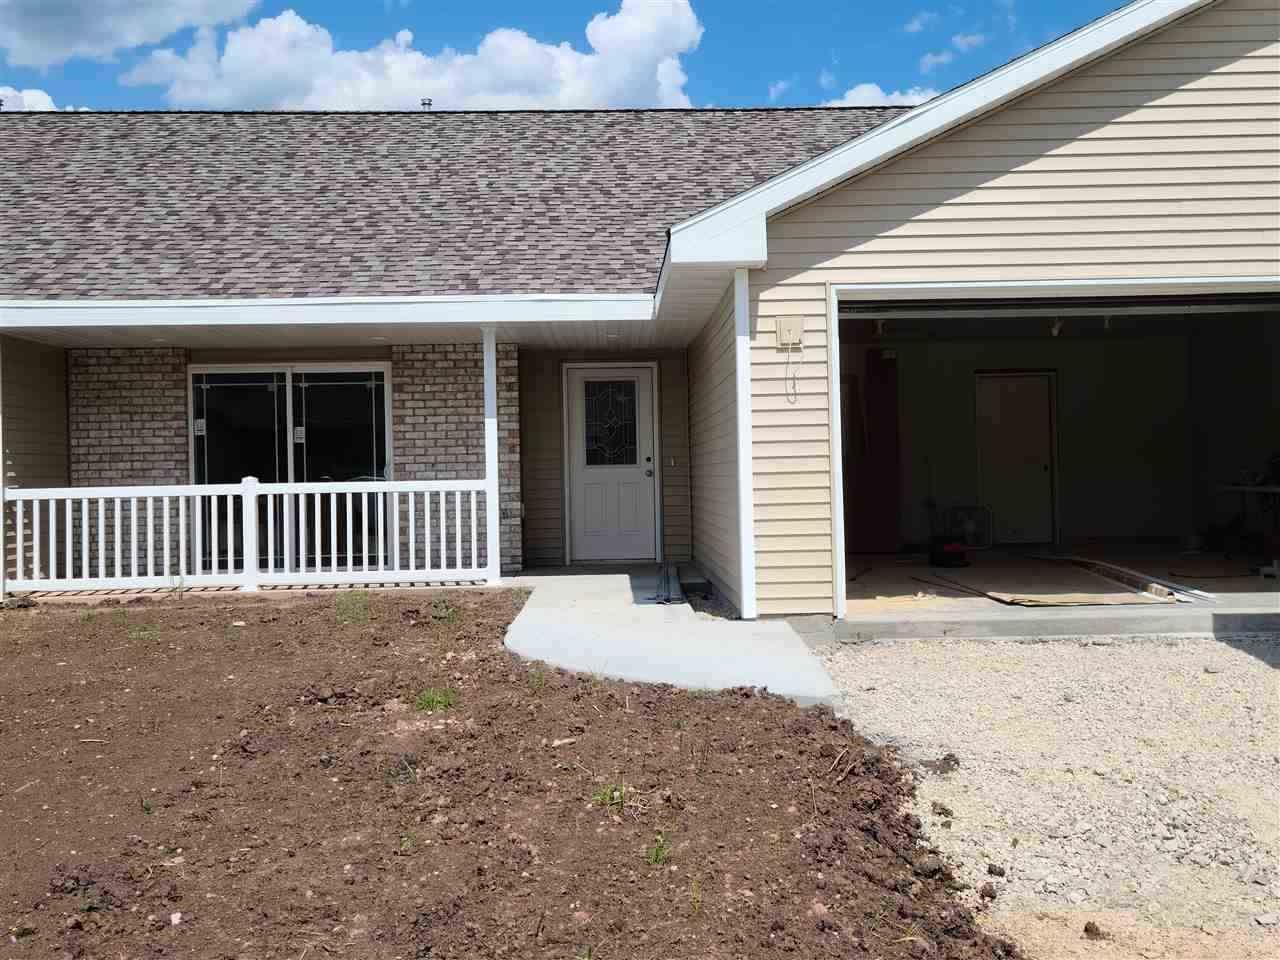 130 STONE CASTLE Drive, Fond du Lac, WI 54935 - MLS#: 50231639